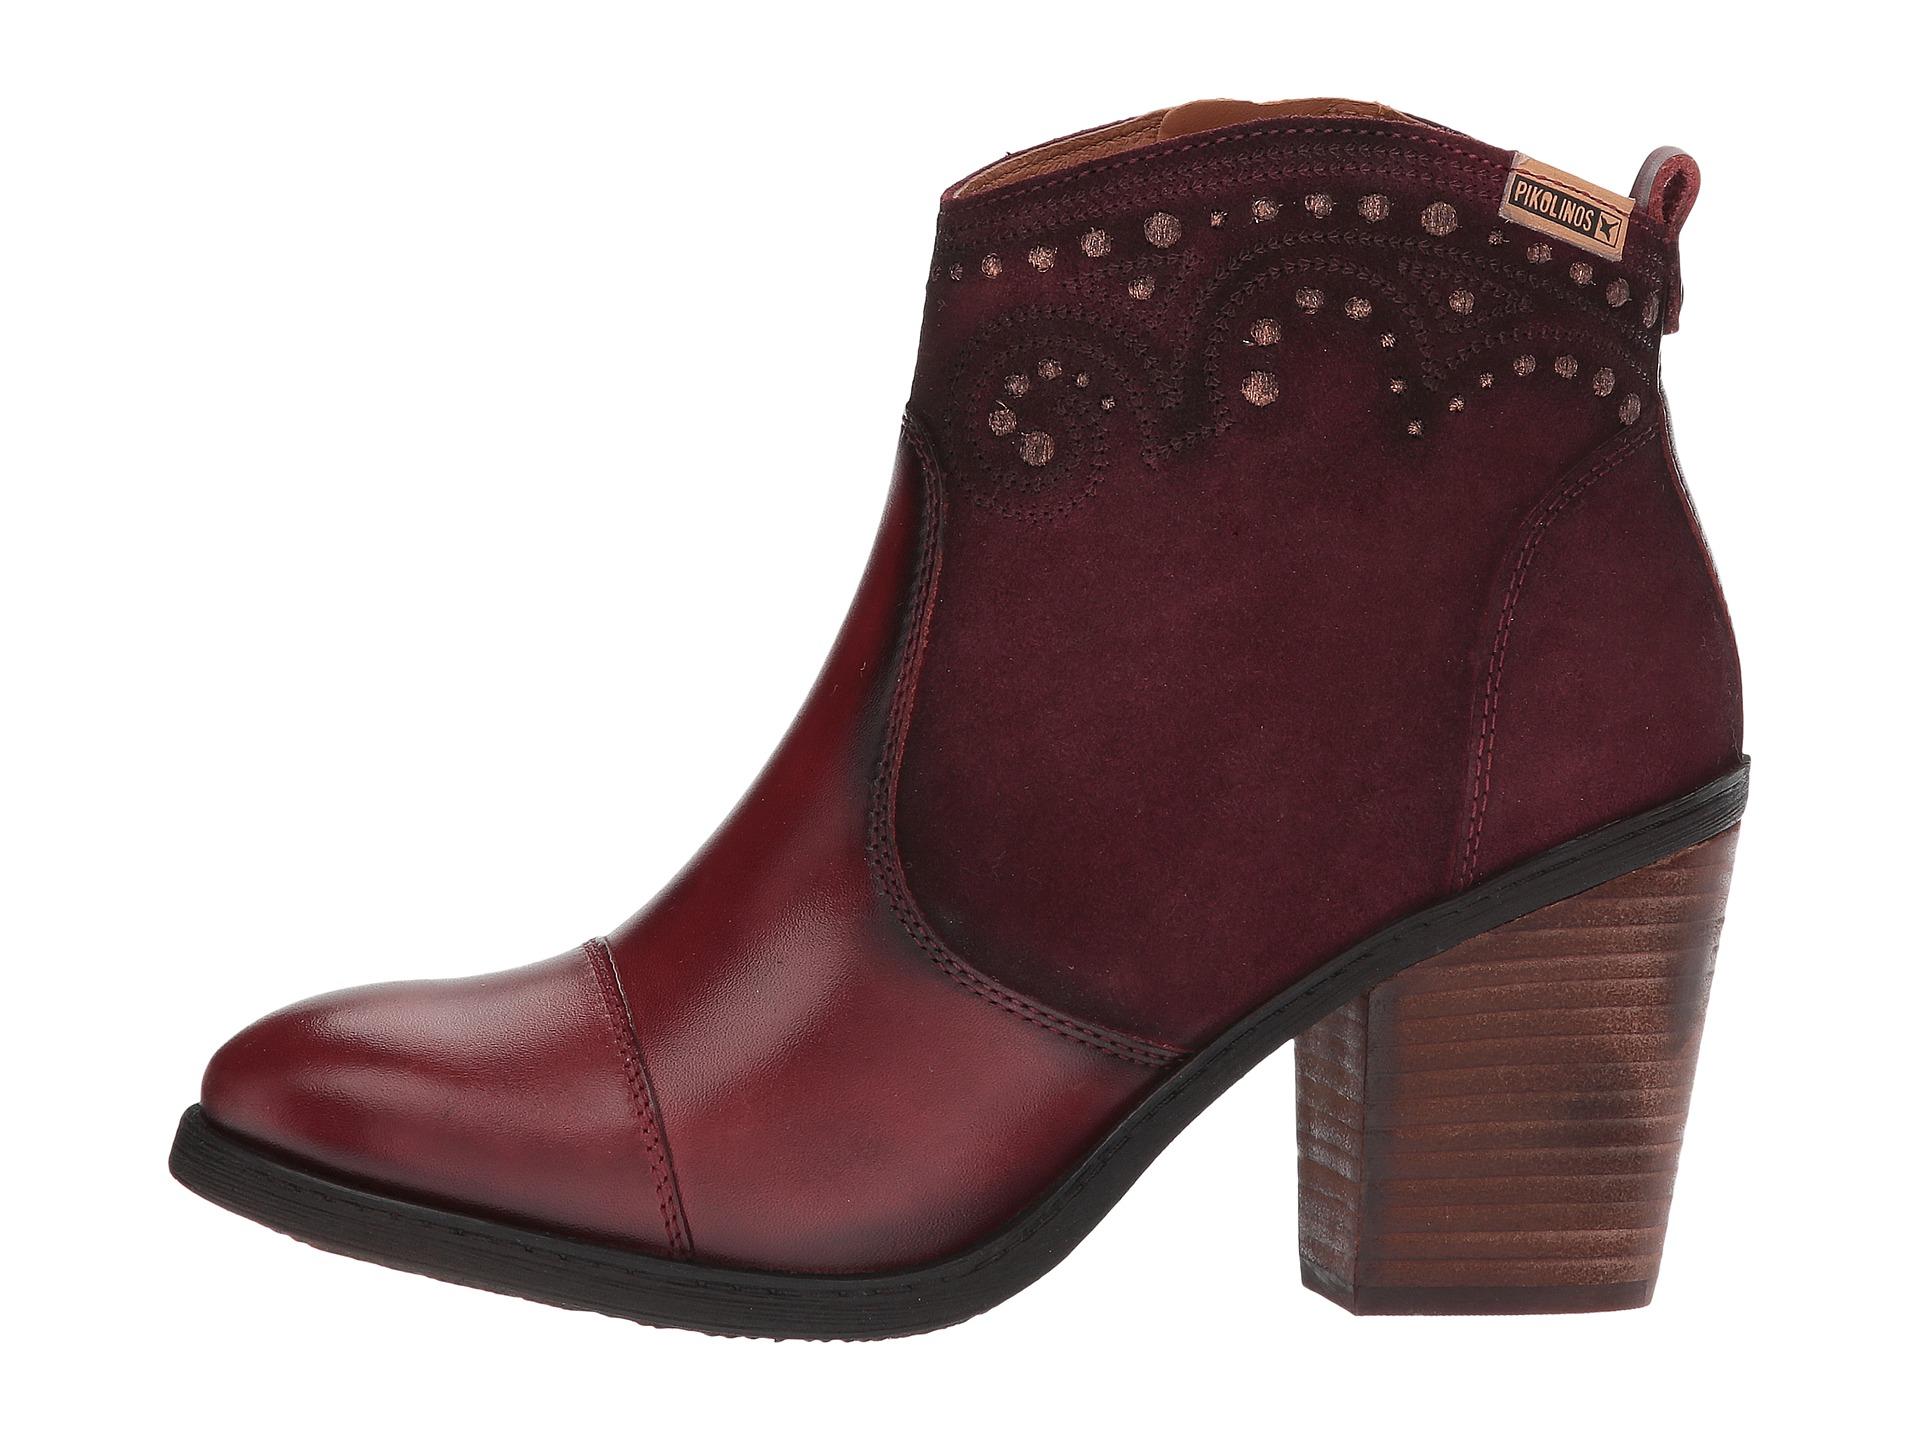 Munro Shoes Size W